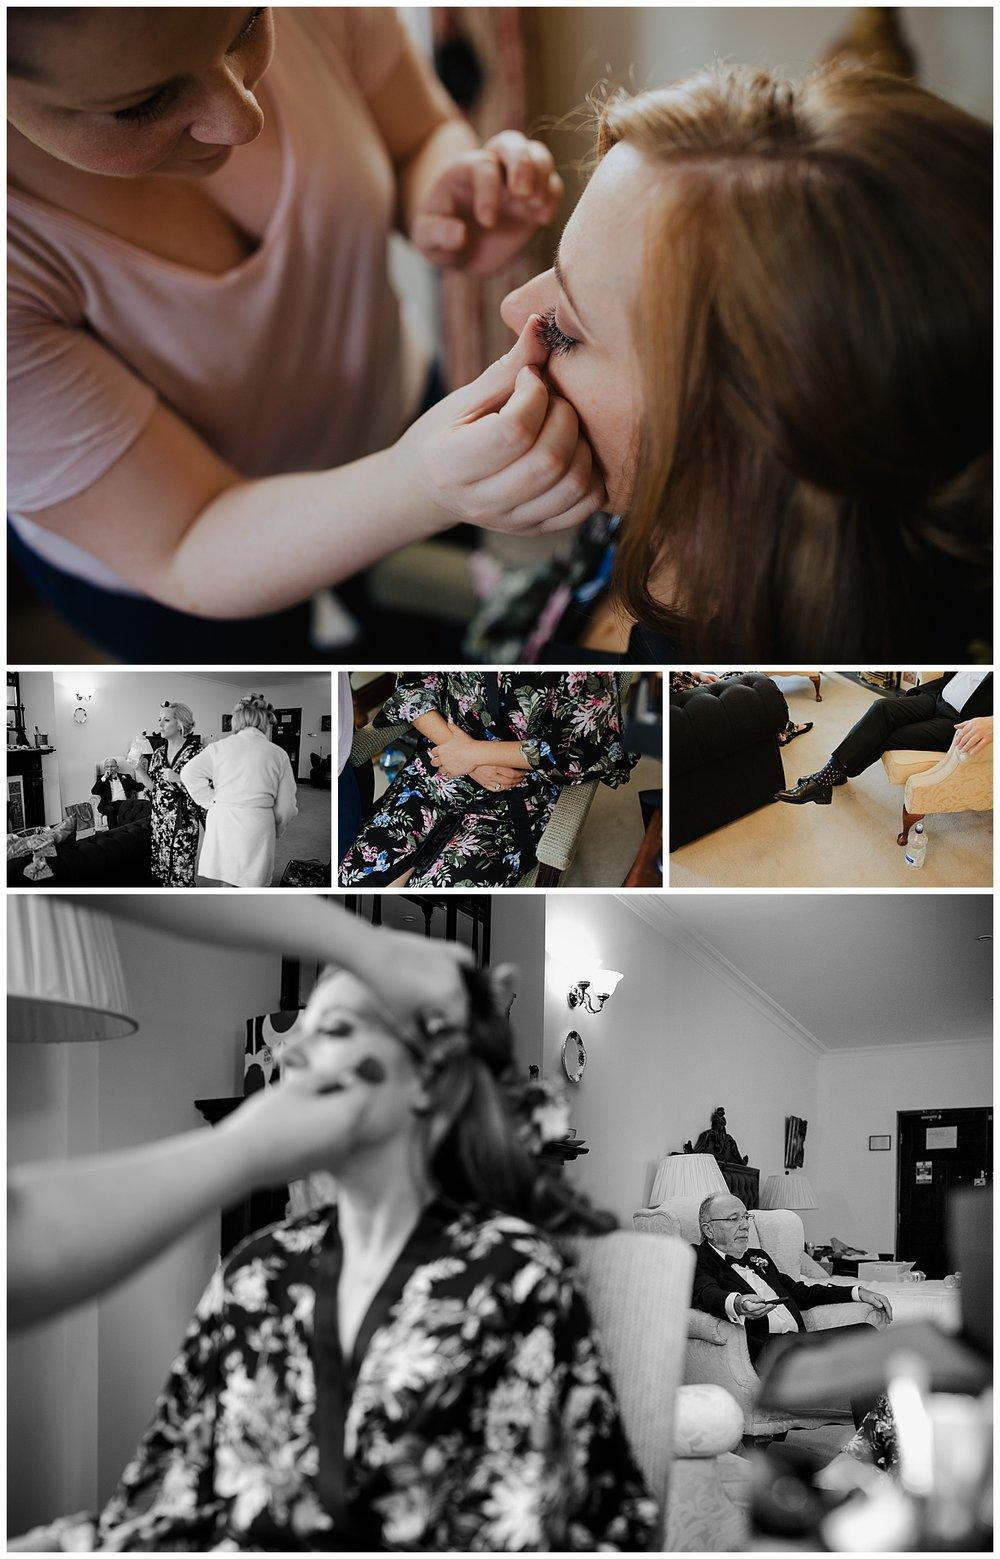 a&c_tinakilly_black_tie_wedding_photographer_livia_figueiredo_29.jpg